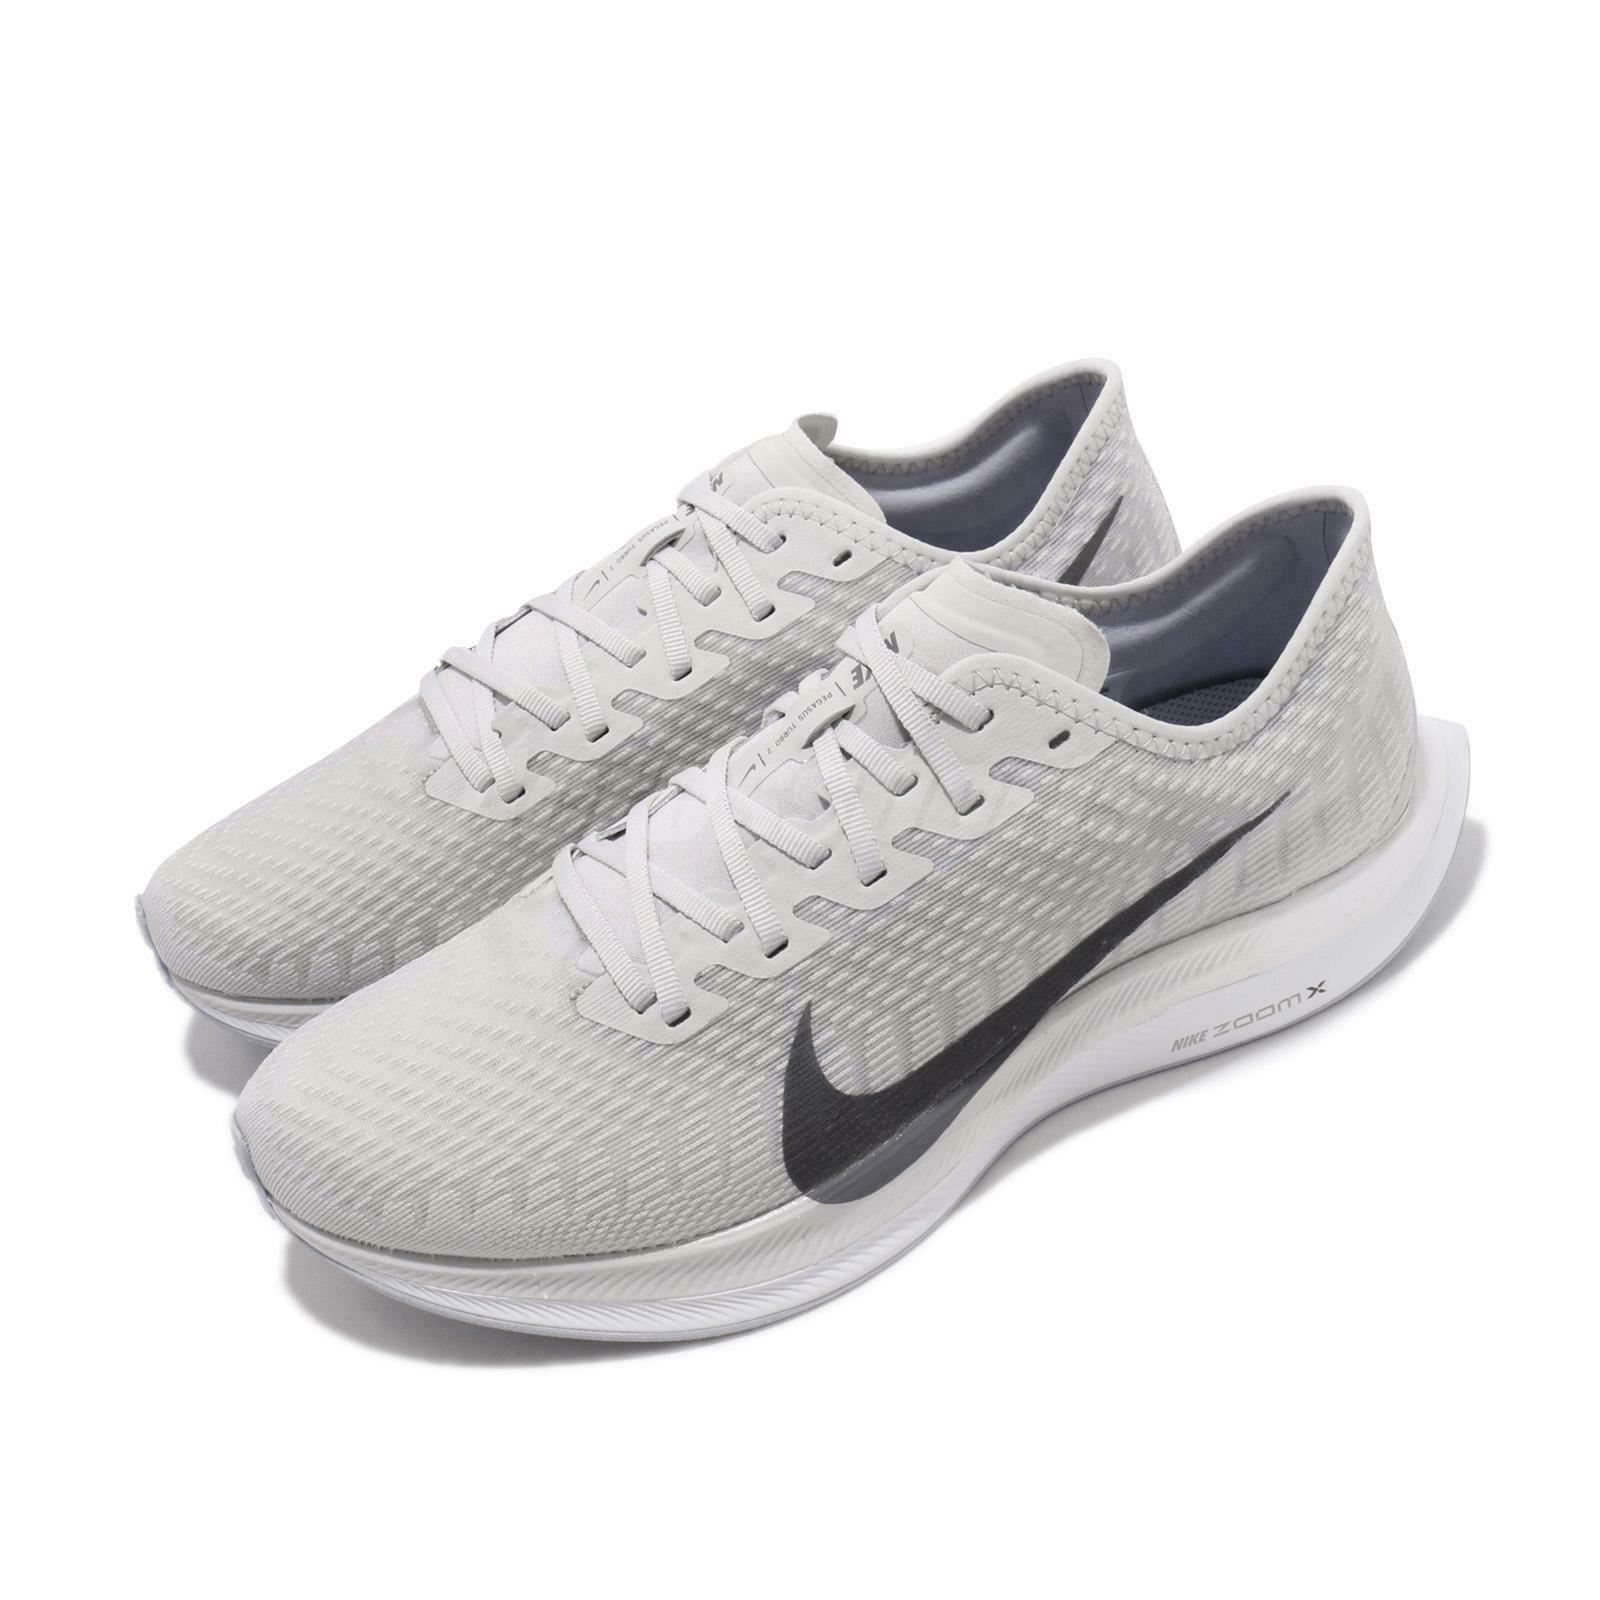 Nike Zoom Pegasus Turbo 2 Vast grau Weiß Sie Laufen schuhe Turnschuhe AT2863-002